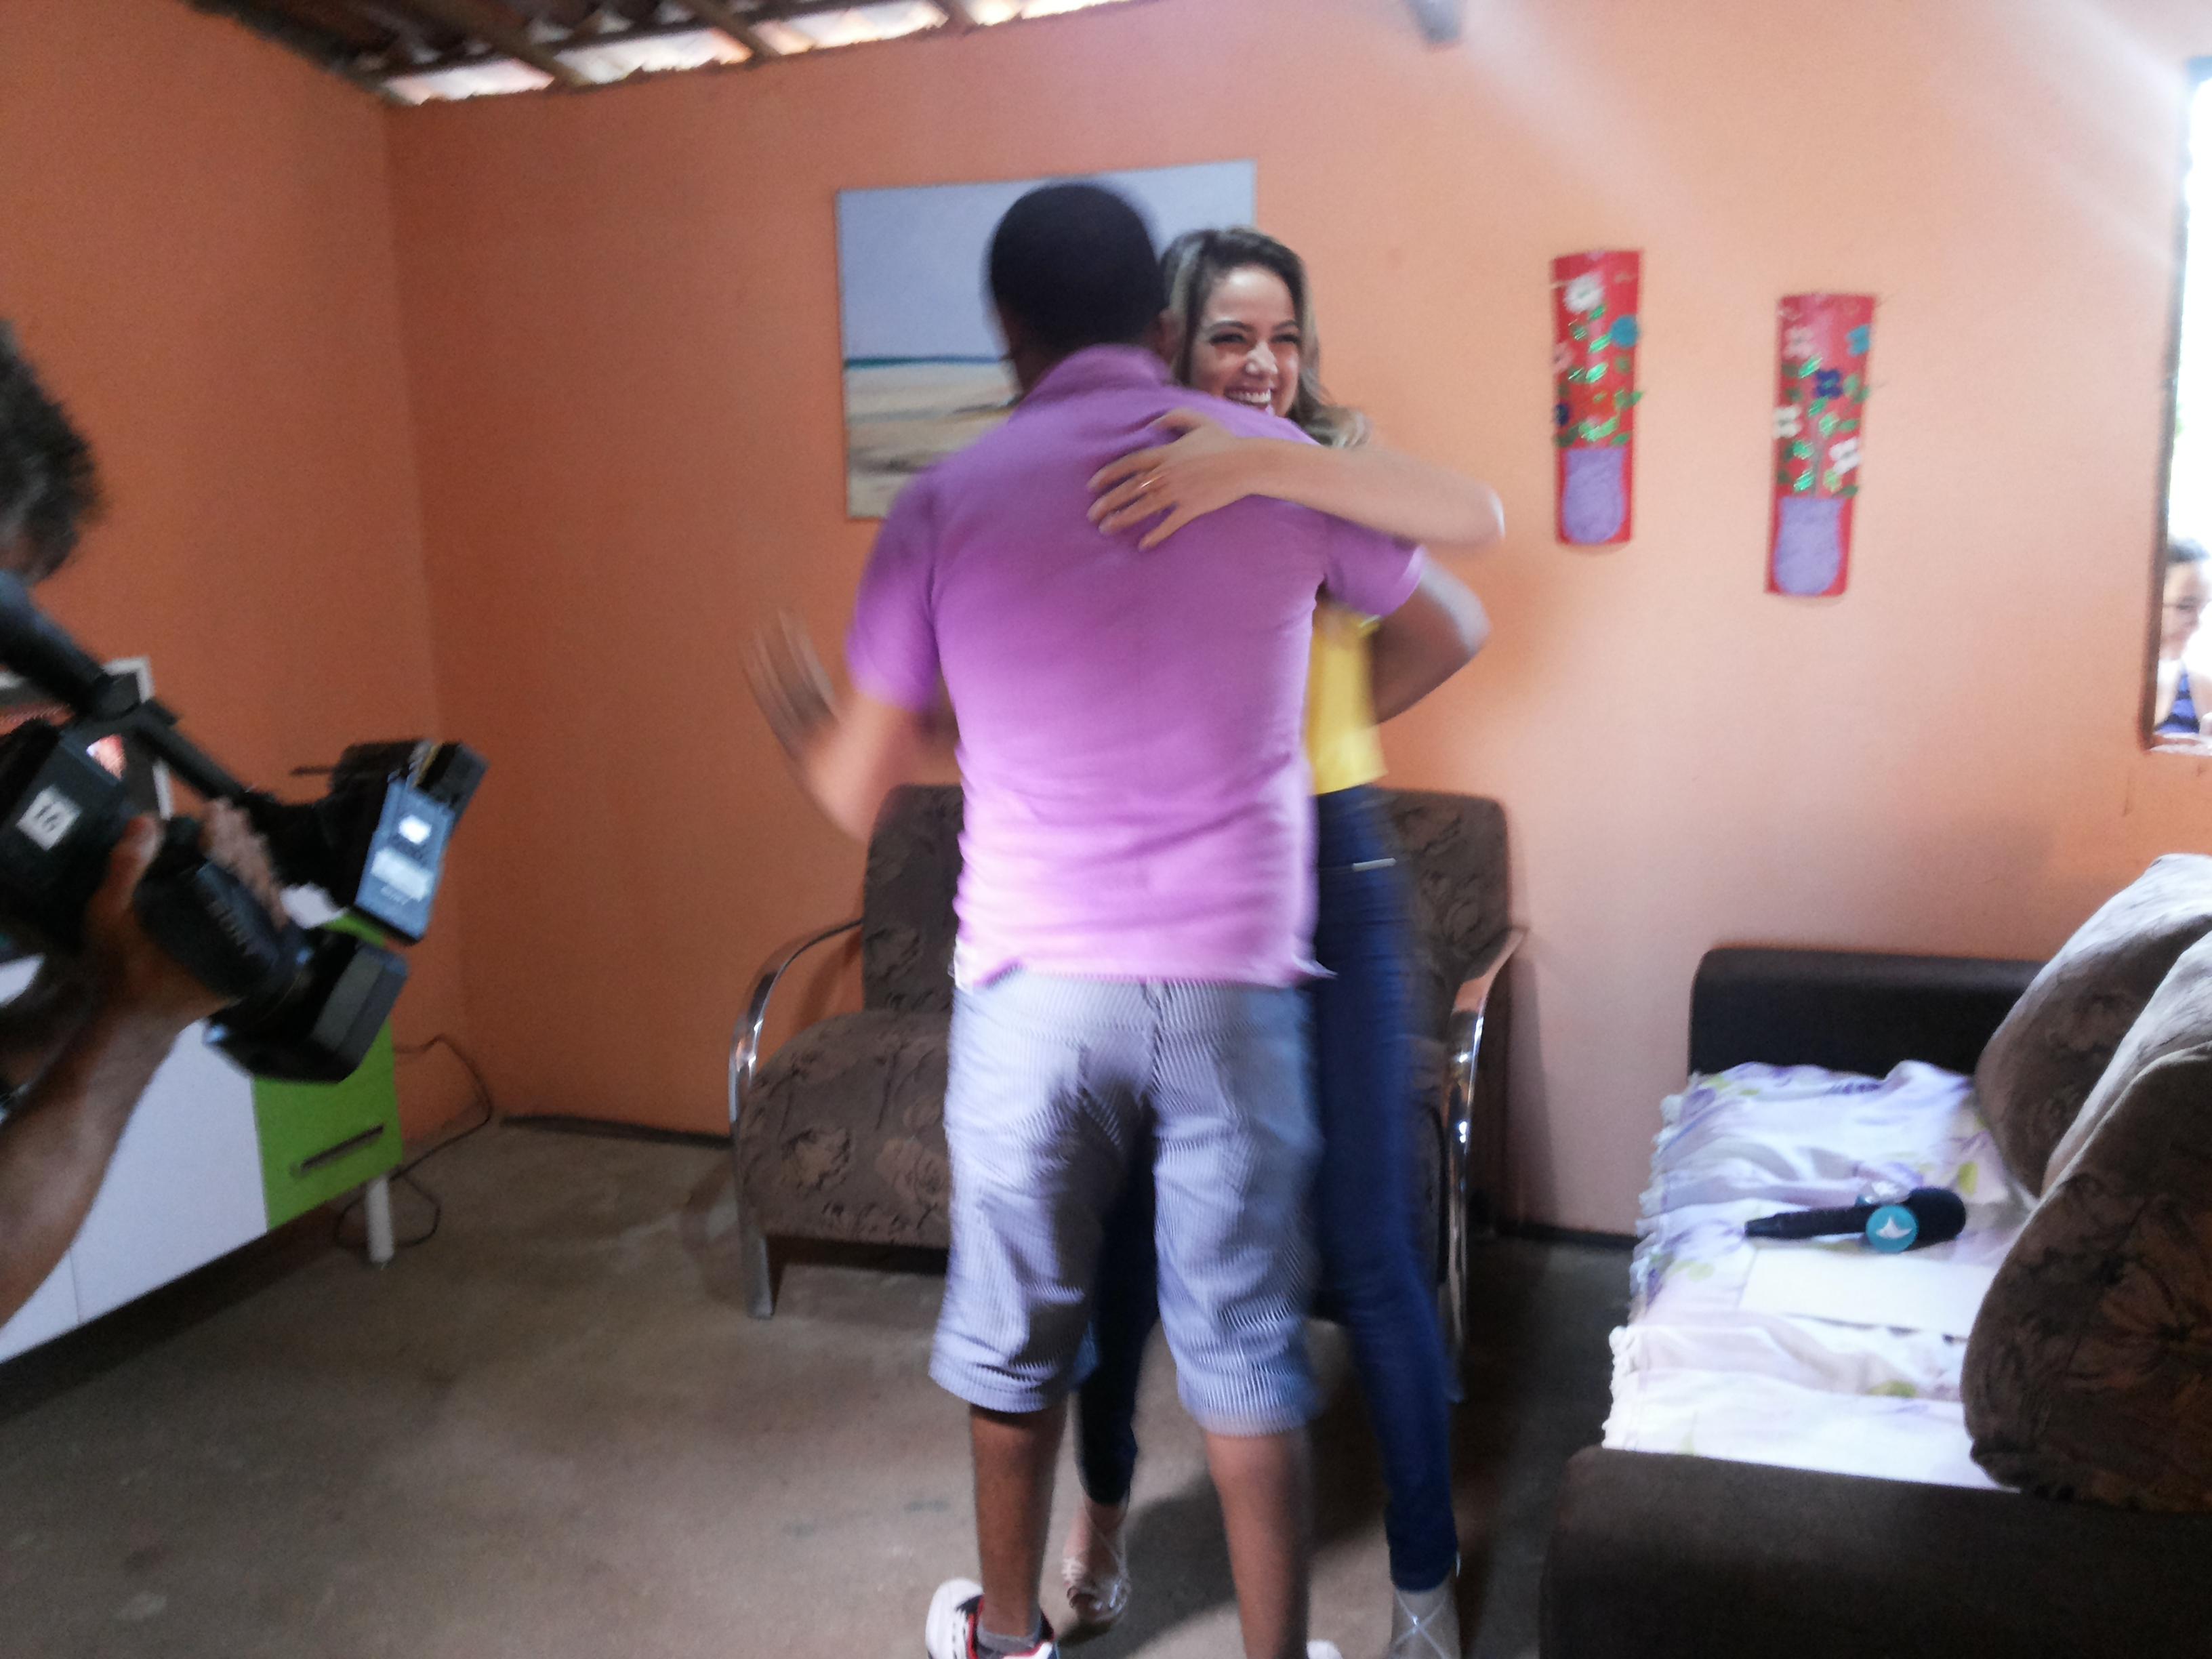 15-11-24 Lorrane Cabral conta a história de Erivando Braga no Gente na TV. Foto Dadynha Saturnino (15)